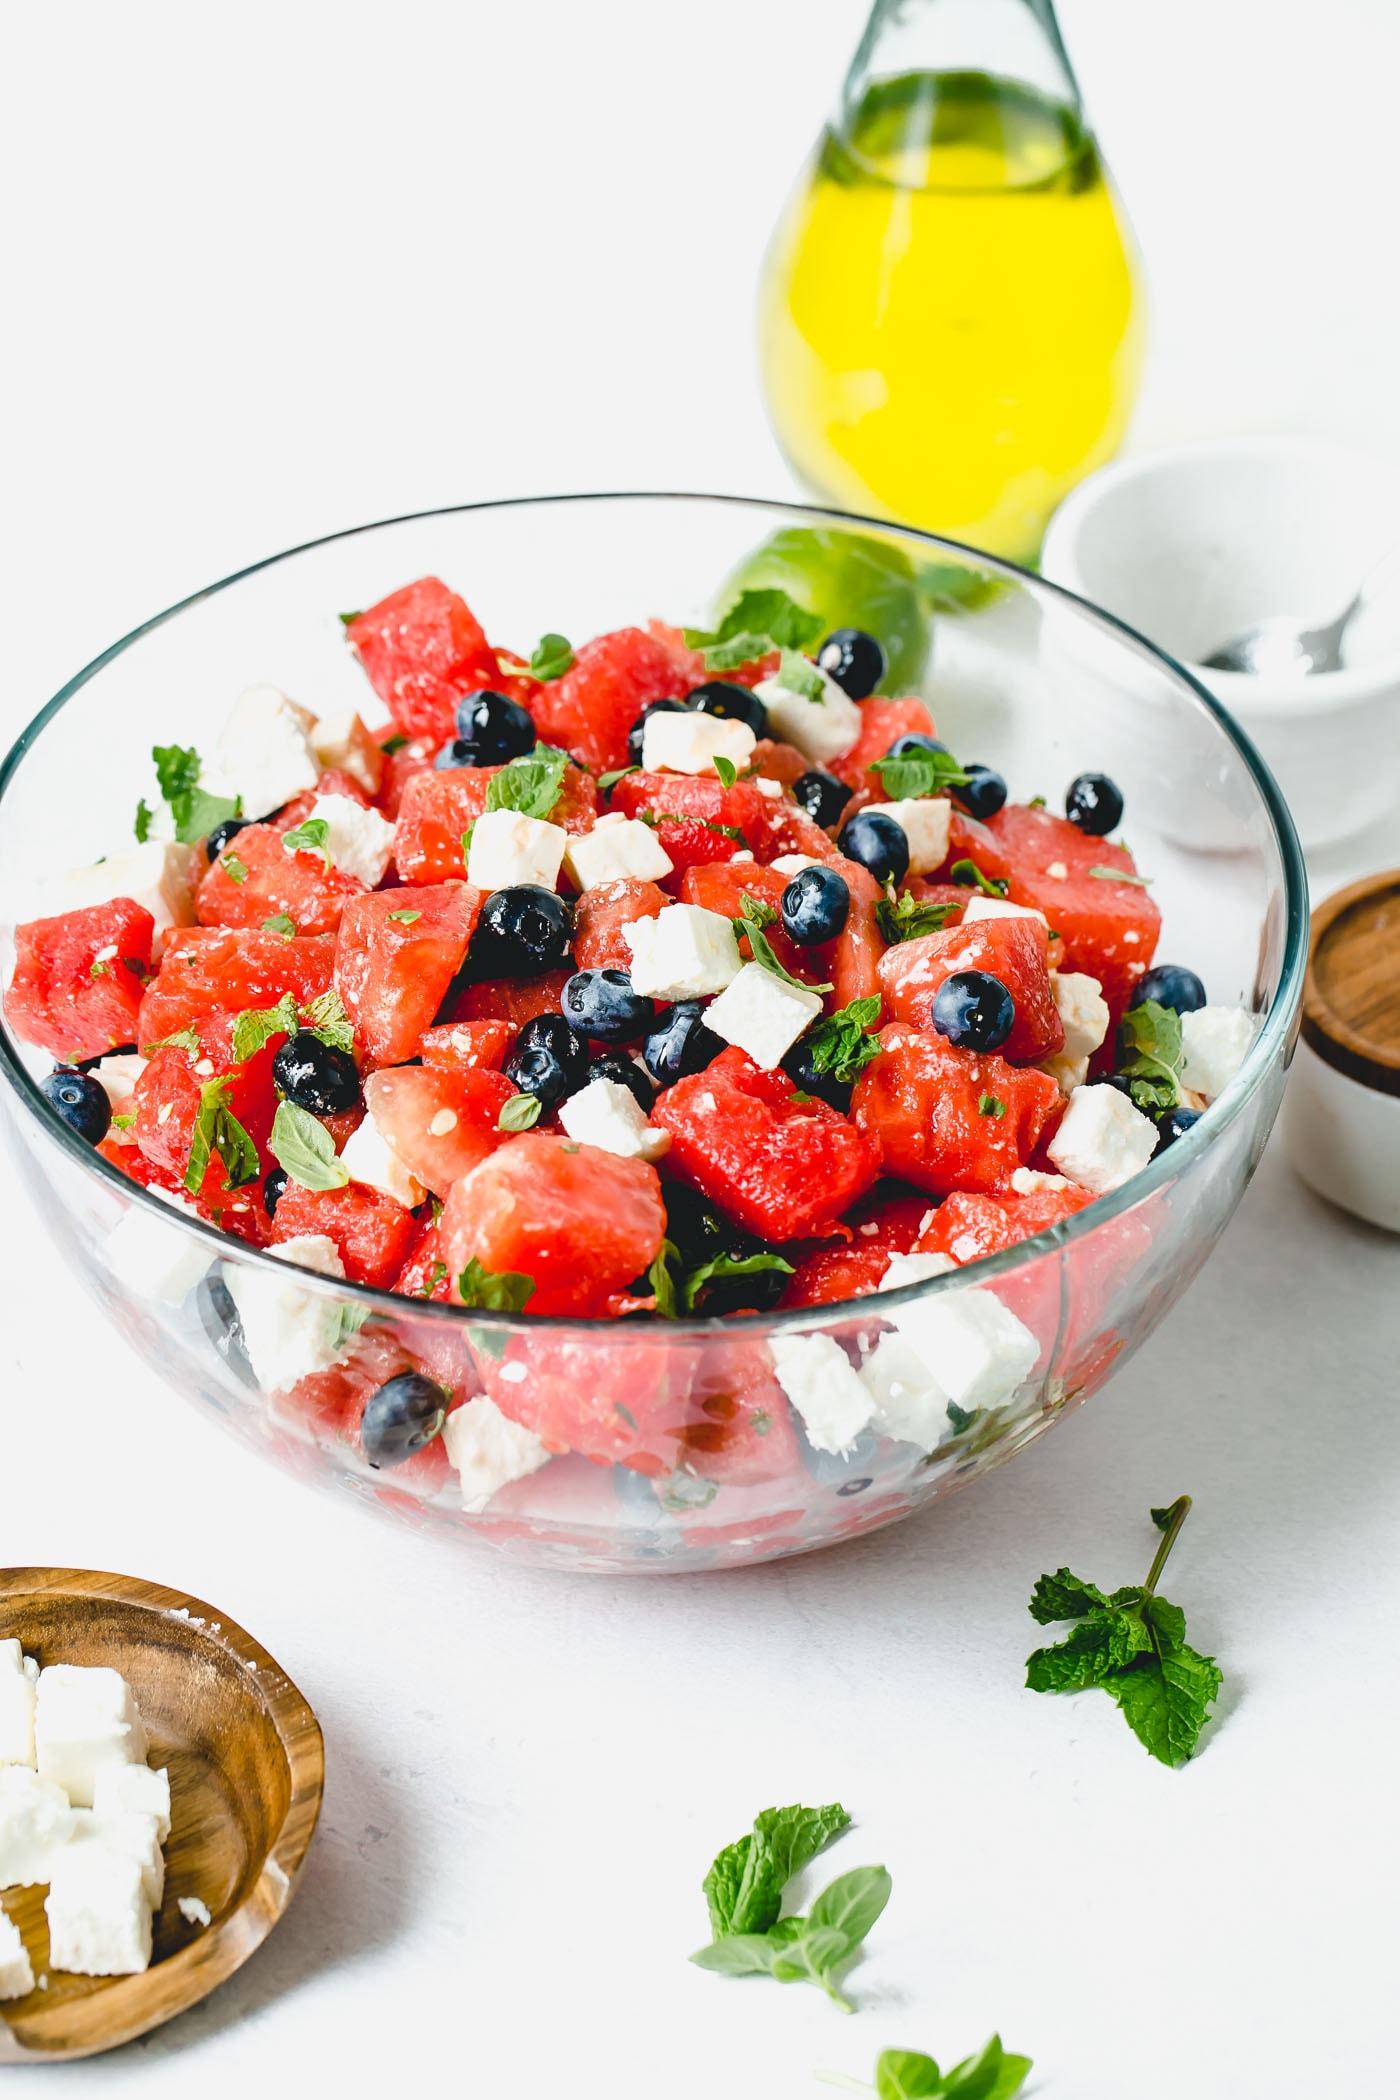 Watermelon and Blueberry Feta Salad